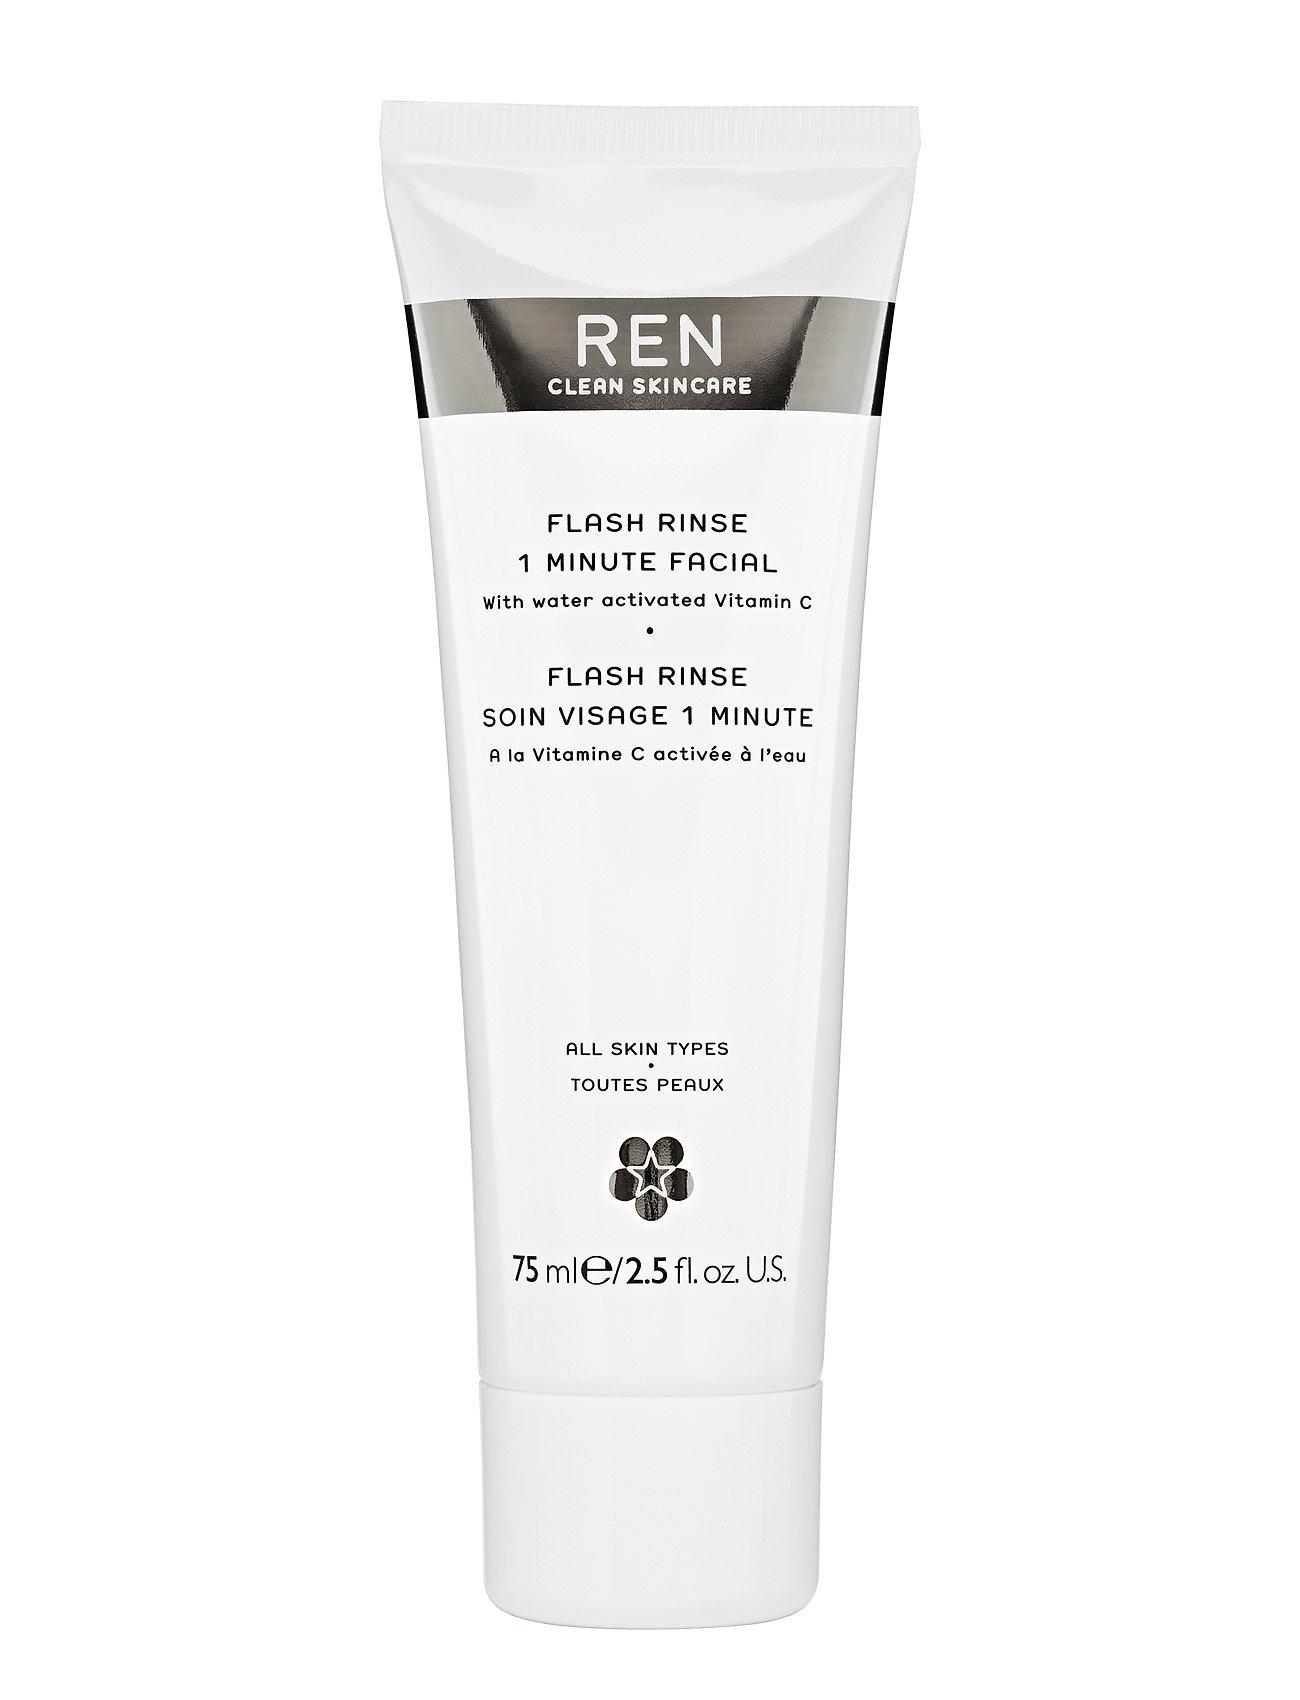 Flash Rinse 1 Minute Facial REN #I/T til Unisex i Klar